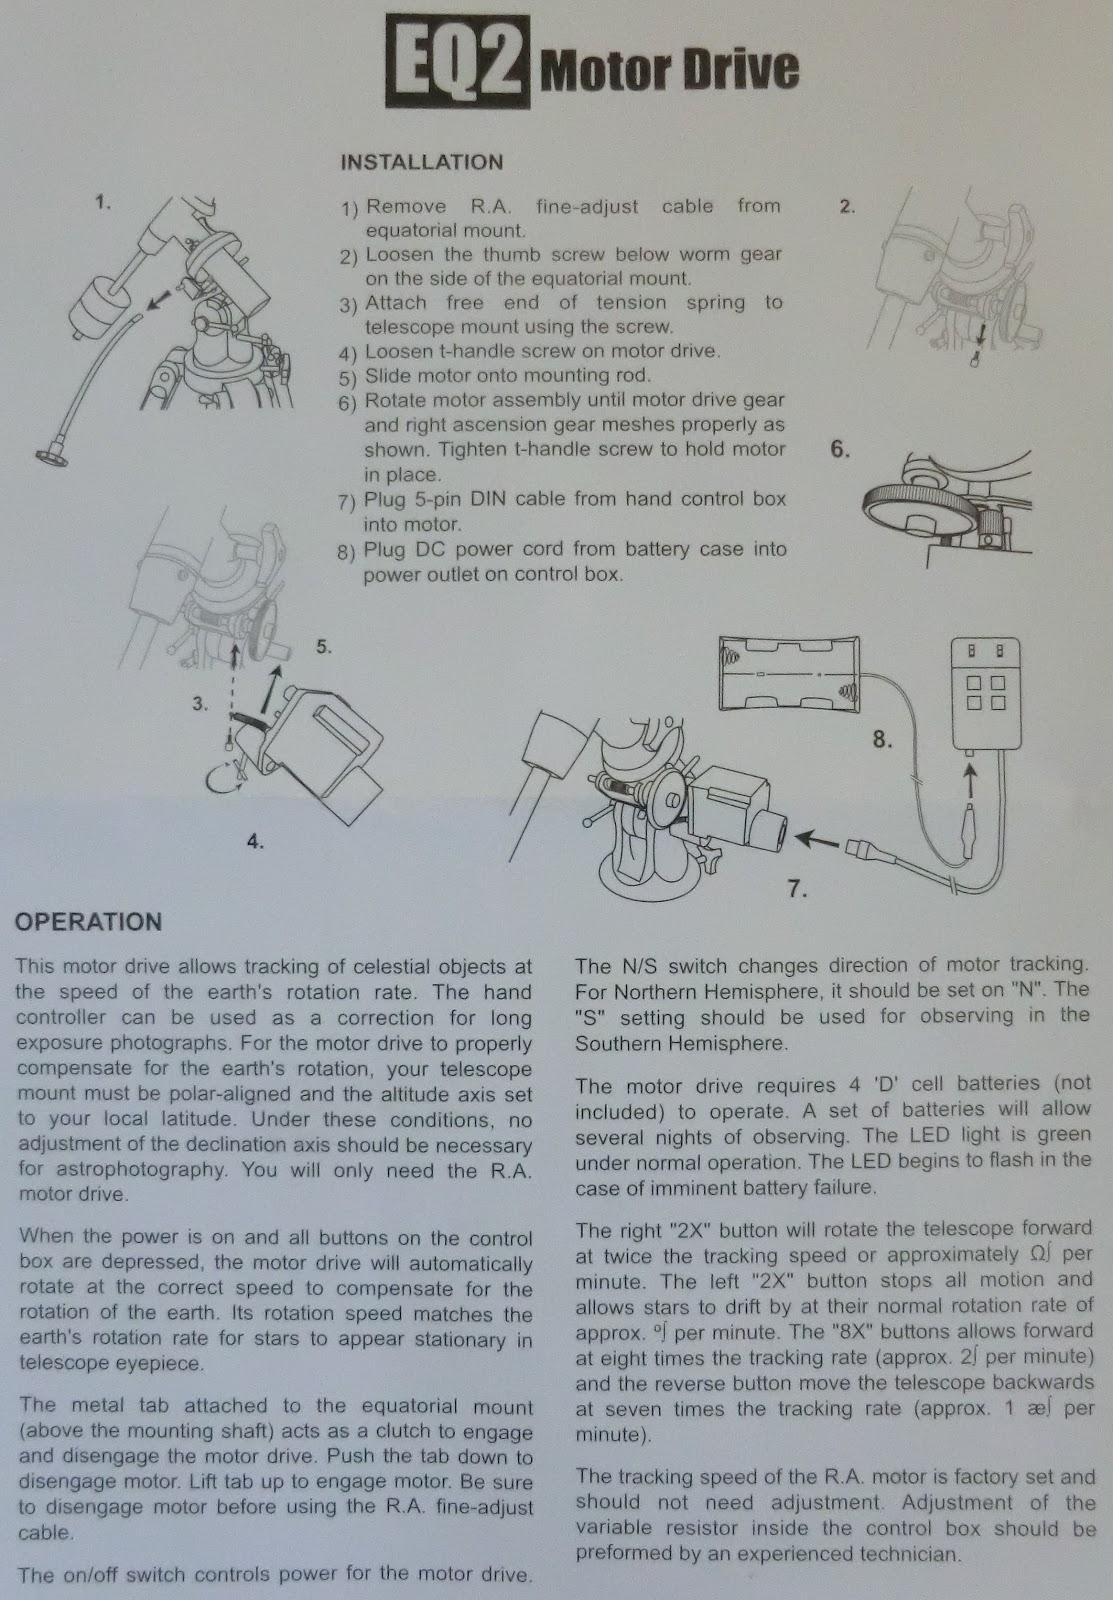 Astro-Beano: Multi-speed motor for SkyWatcher EQ2 mount